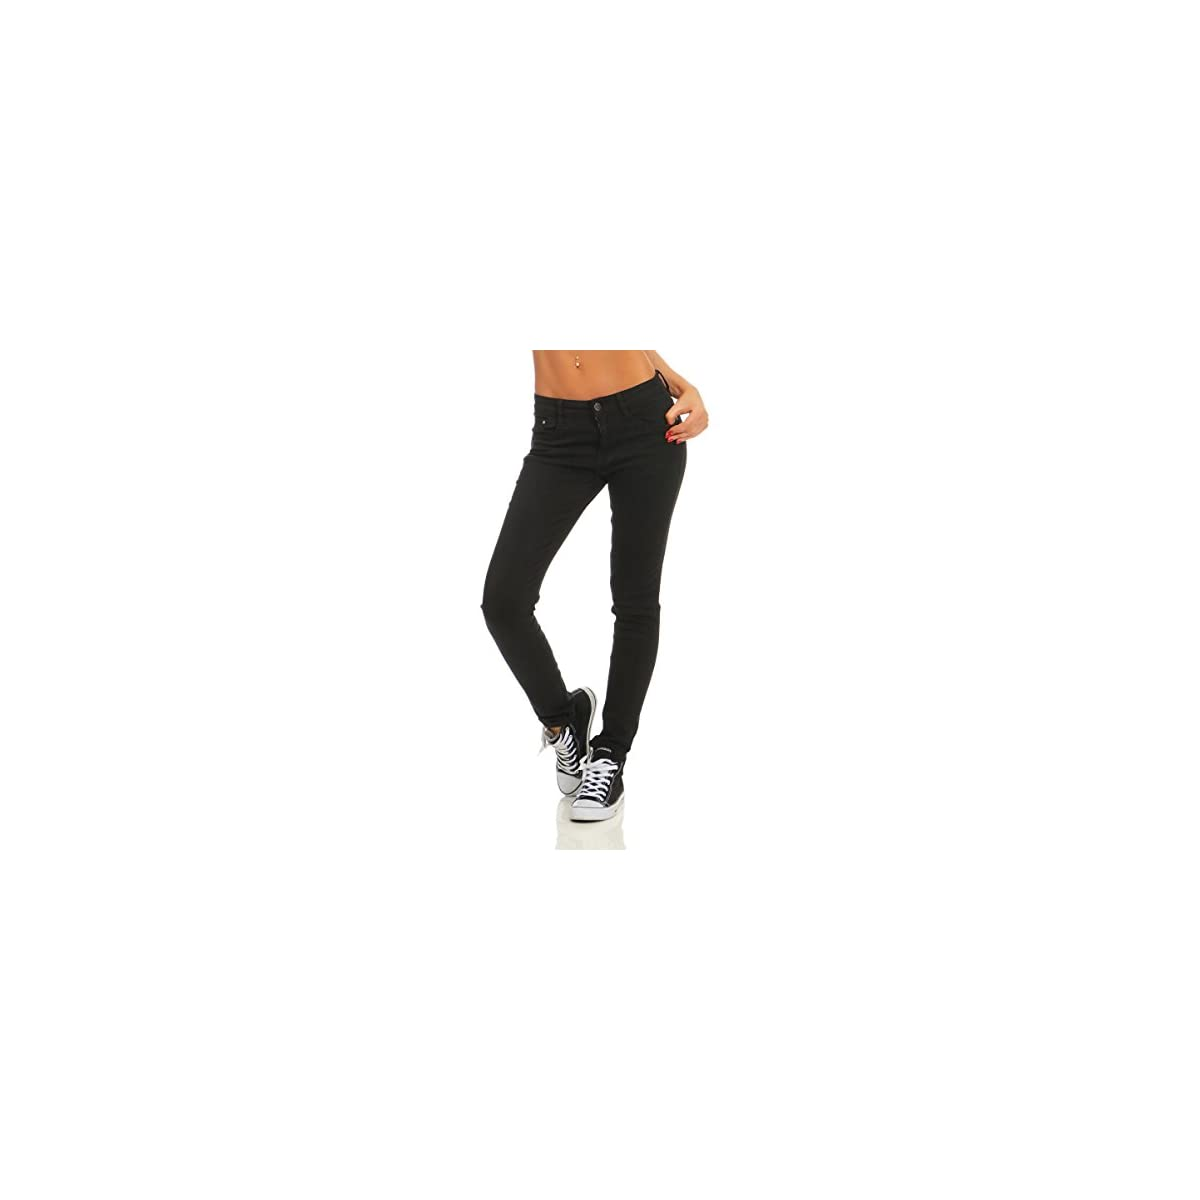 Fashion4Young 4345 Damen Hose Röhre Skinny schwarz